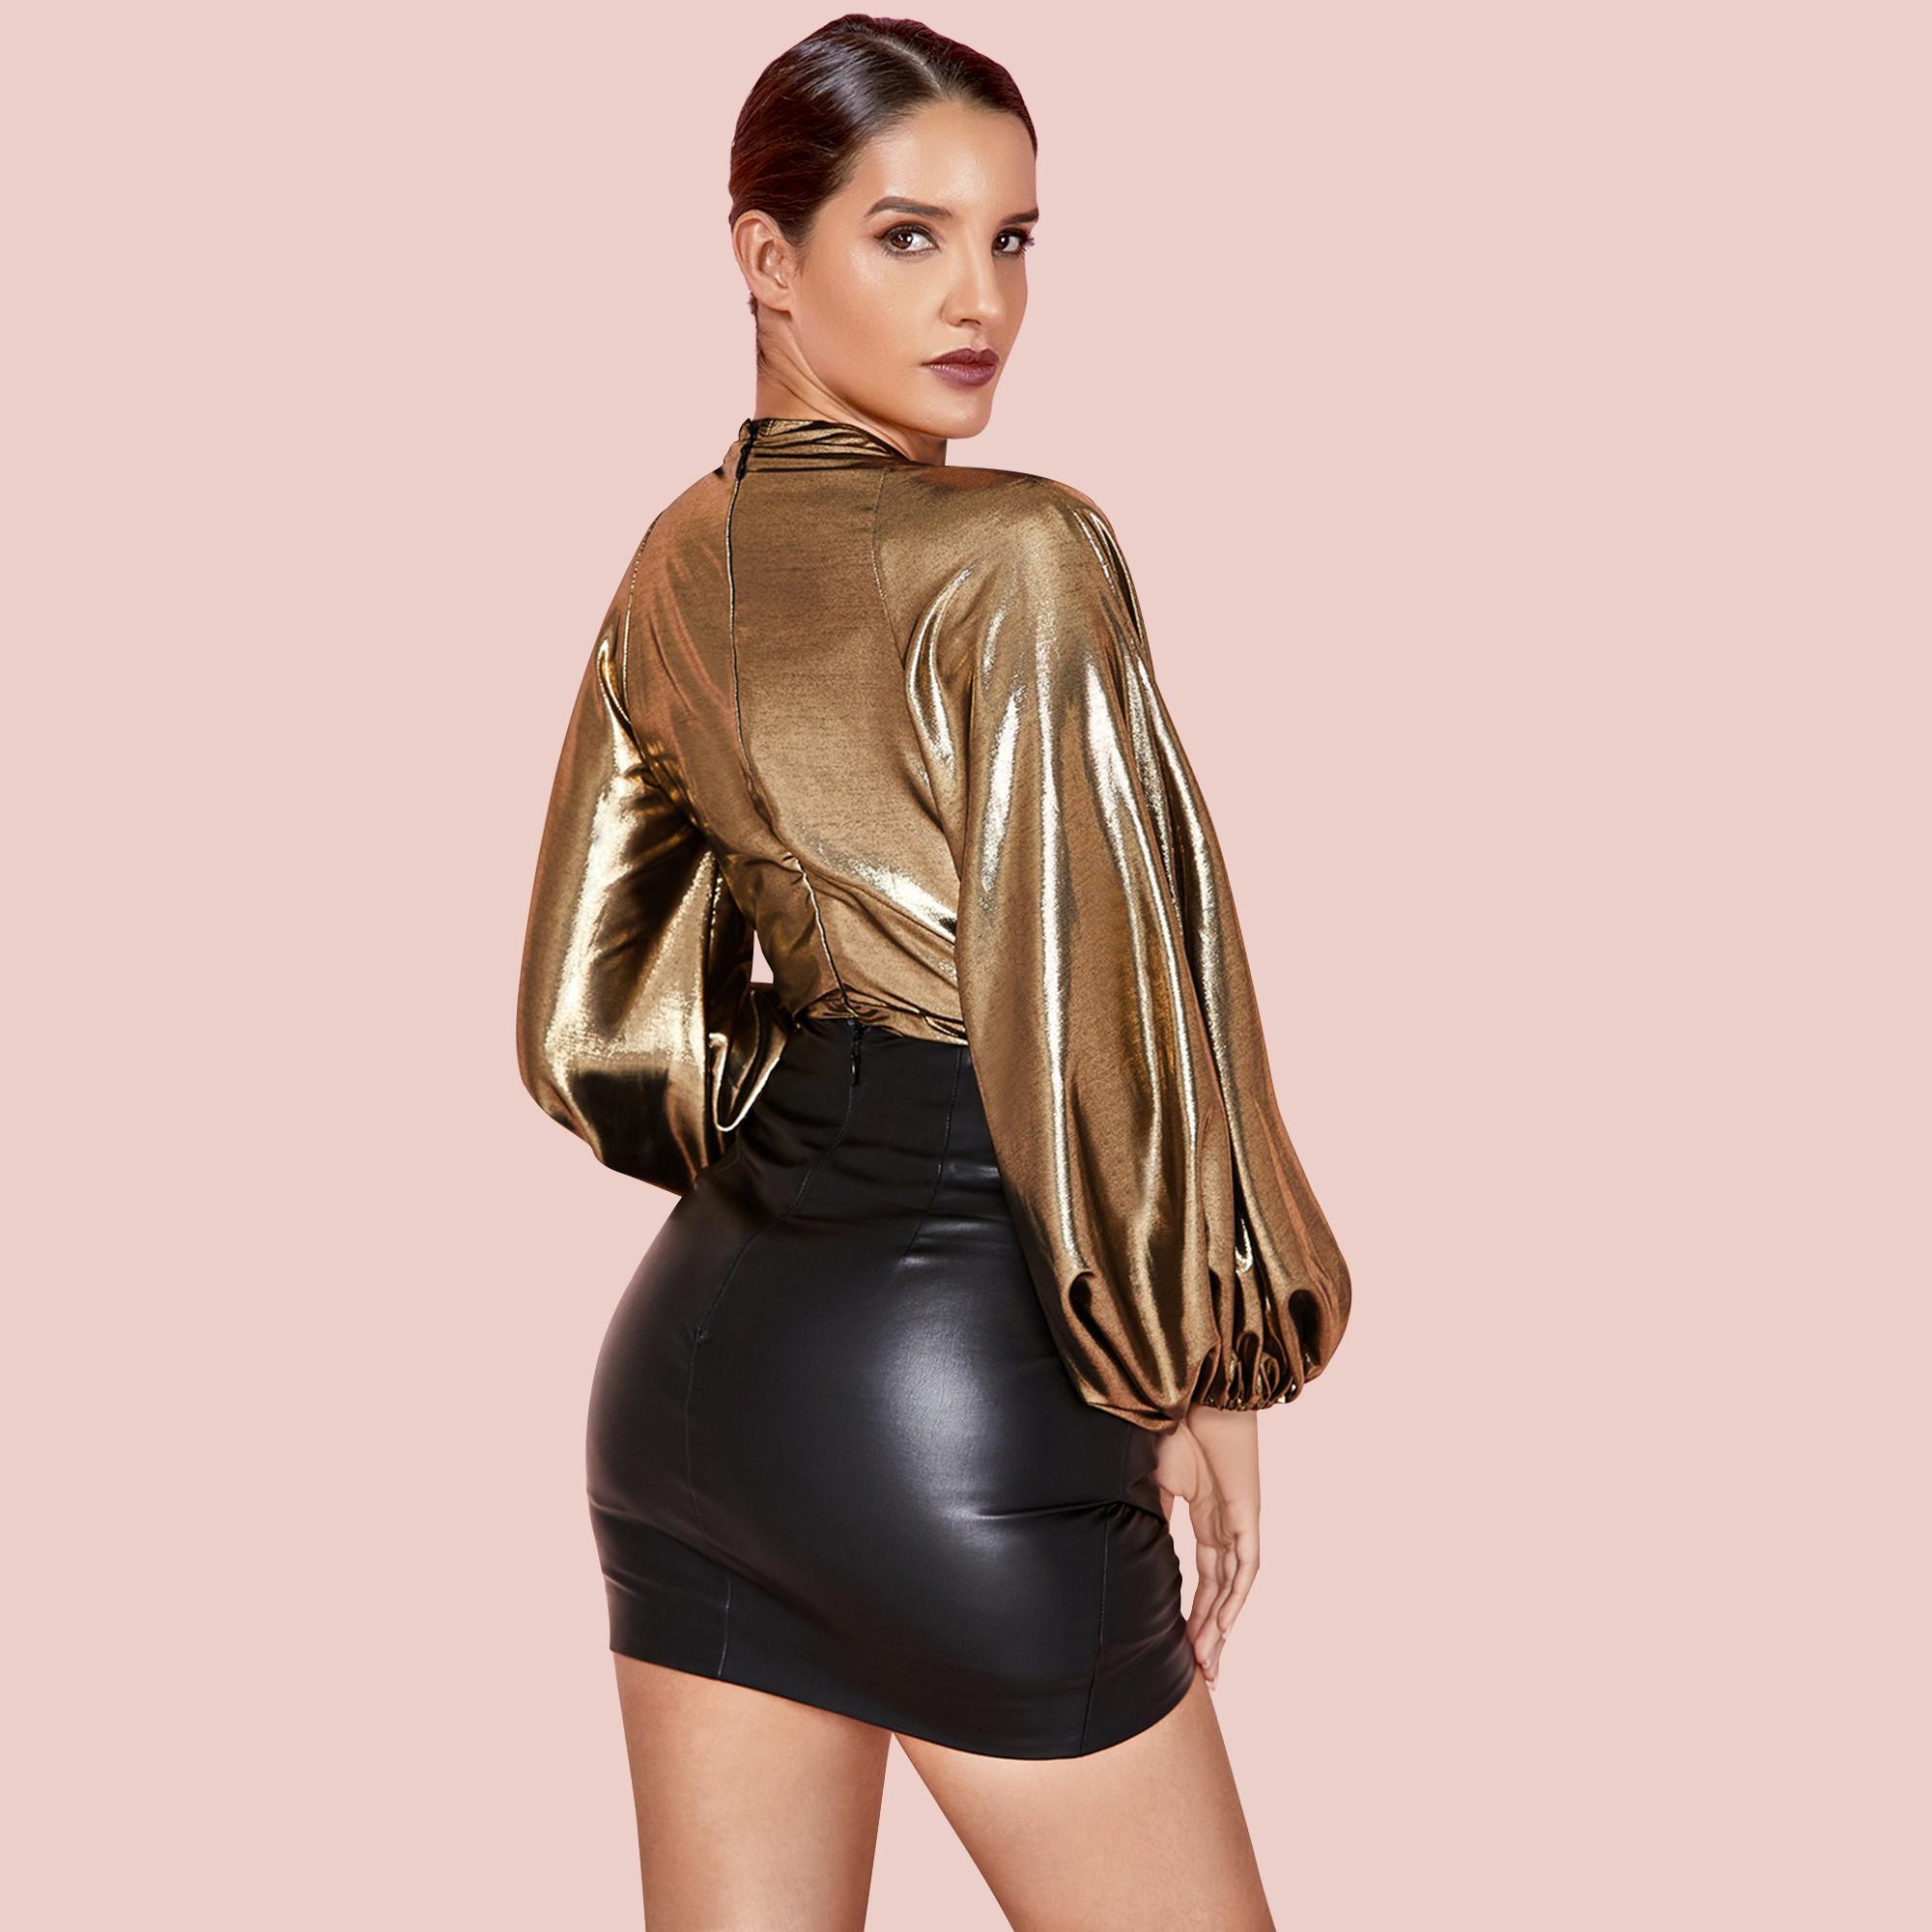 Gold V Neck Long Sleeve Mini Puff Sleeve Wrinkled Bodycon Set HI1101-Gold